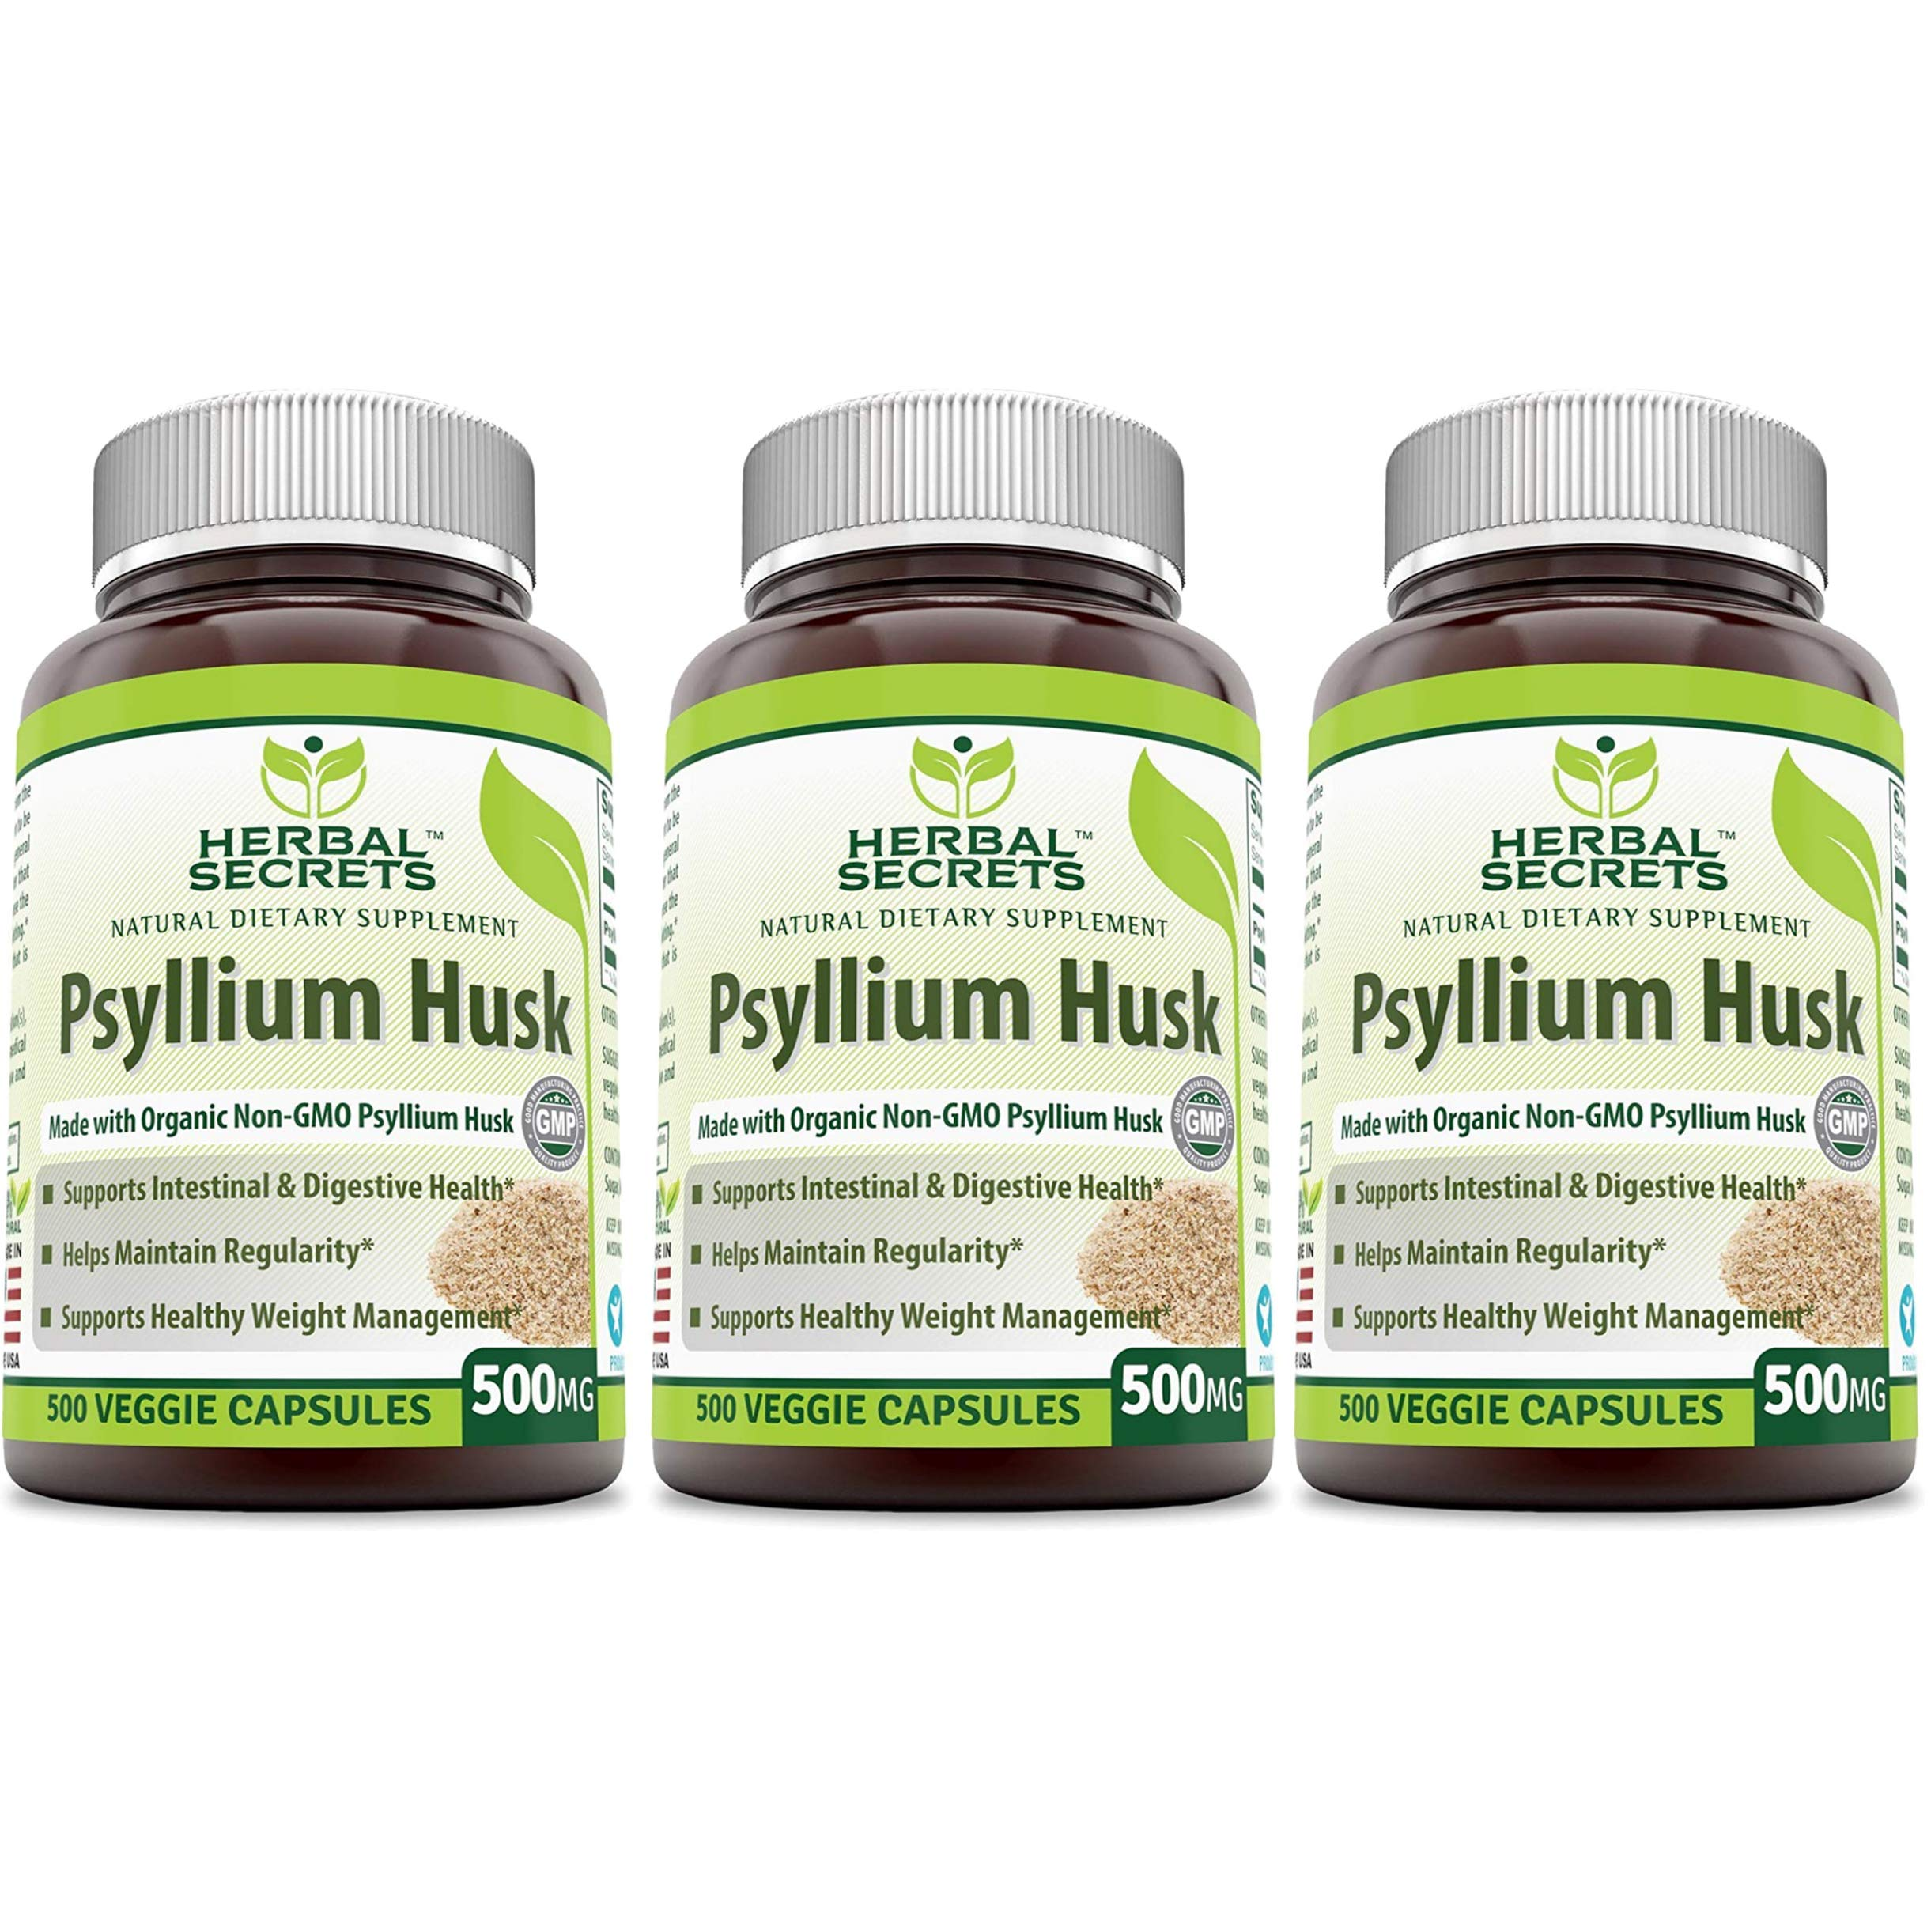 Herbal Secrets Psyllium Husk 500 Mg 500 Veggie Capsules (Pack of 3-500 Capsule Bottles)